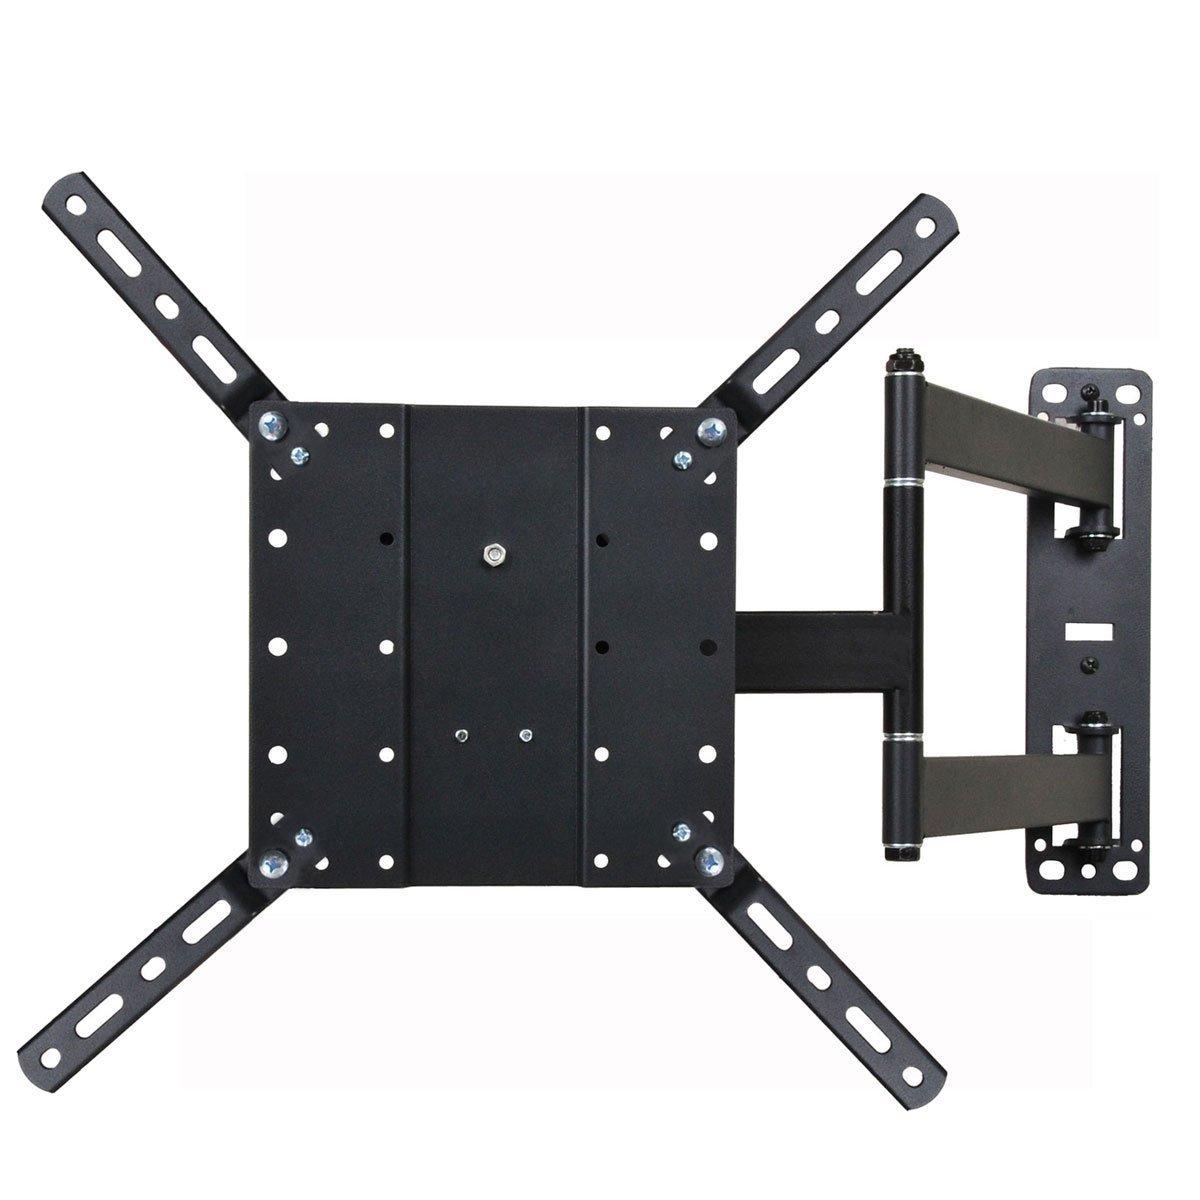 VideoSecu Articulating Mount Tilting TV Wall Mount for Most Vizio Samsung Sharp LG Sony 26 – 55 LCD LED Plasma TV Fit VESA 400×400, 400×300, 400×200, 300×300, 300×200, 200×200, 200x100mm ML550B 1KB